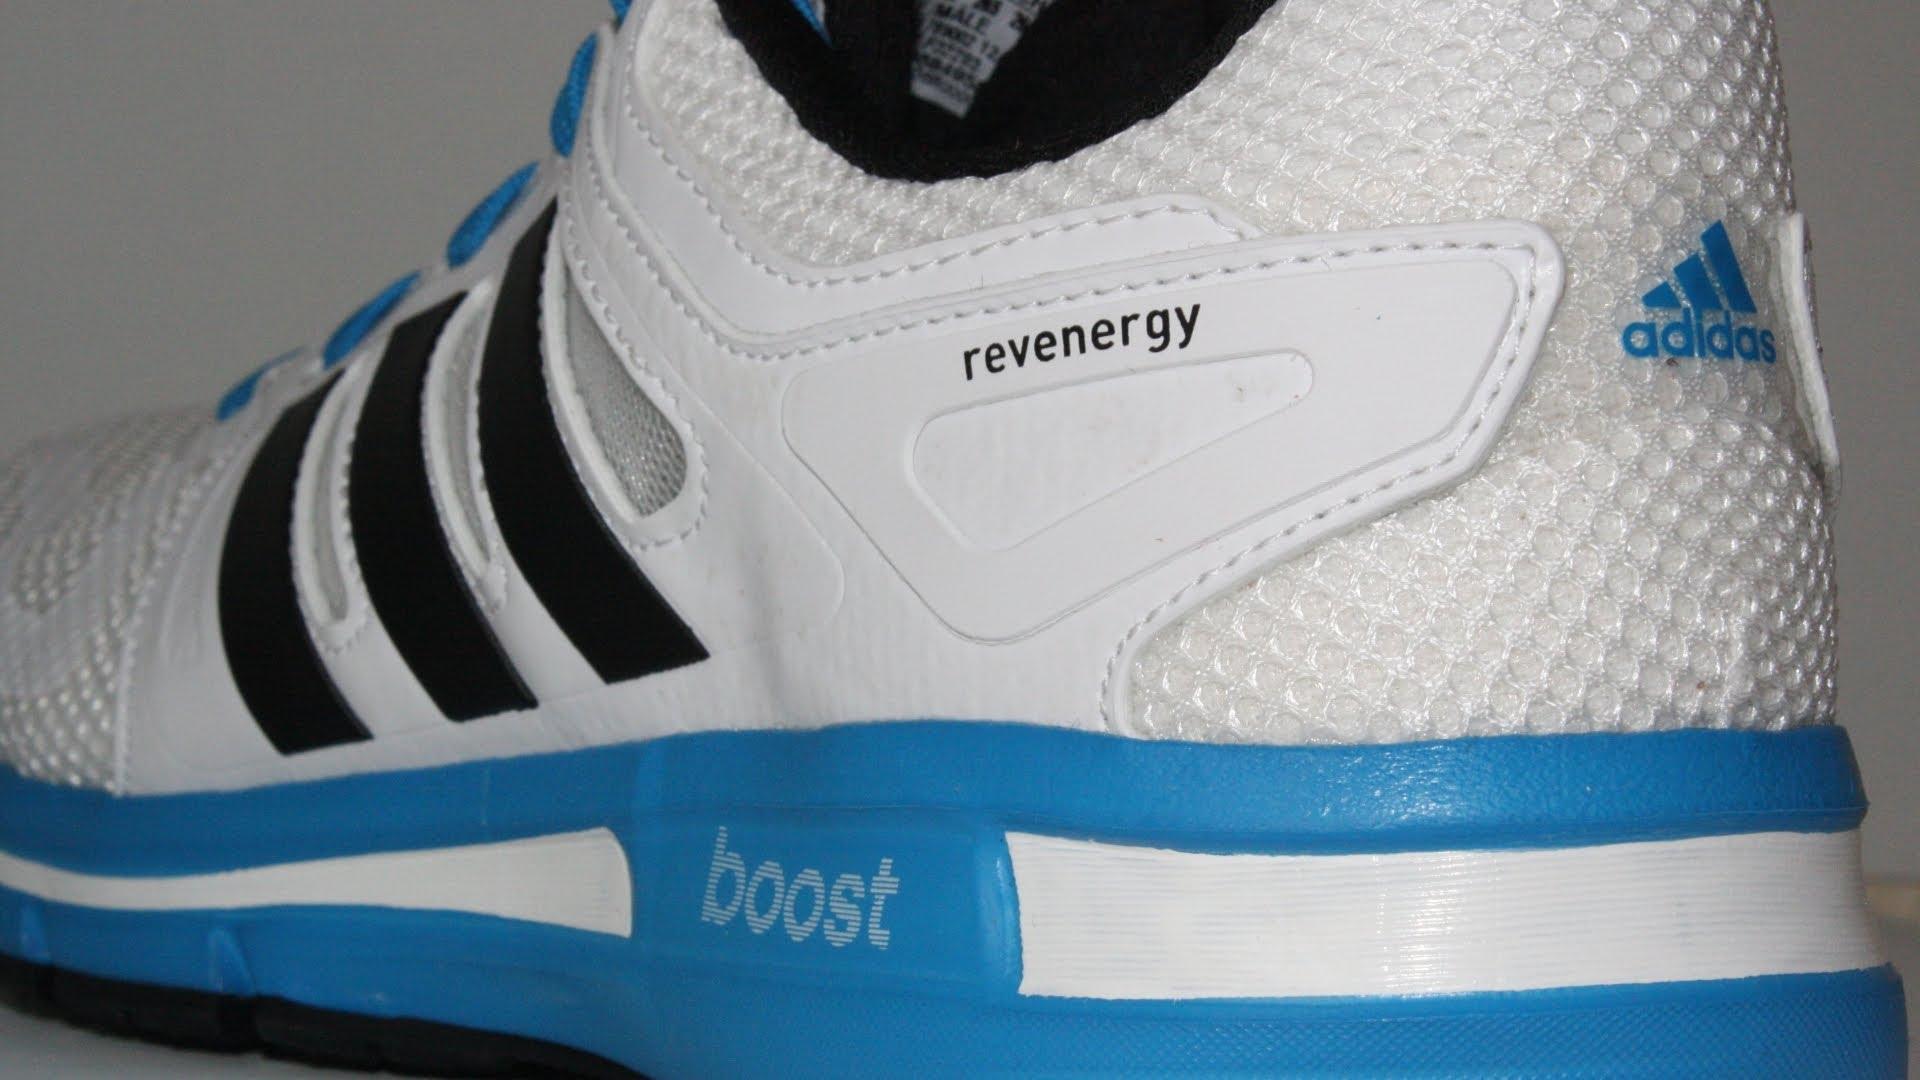 adidas Revenergy Boost ??? Energy Boost ??????????????? Pantip